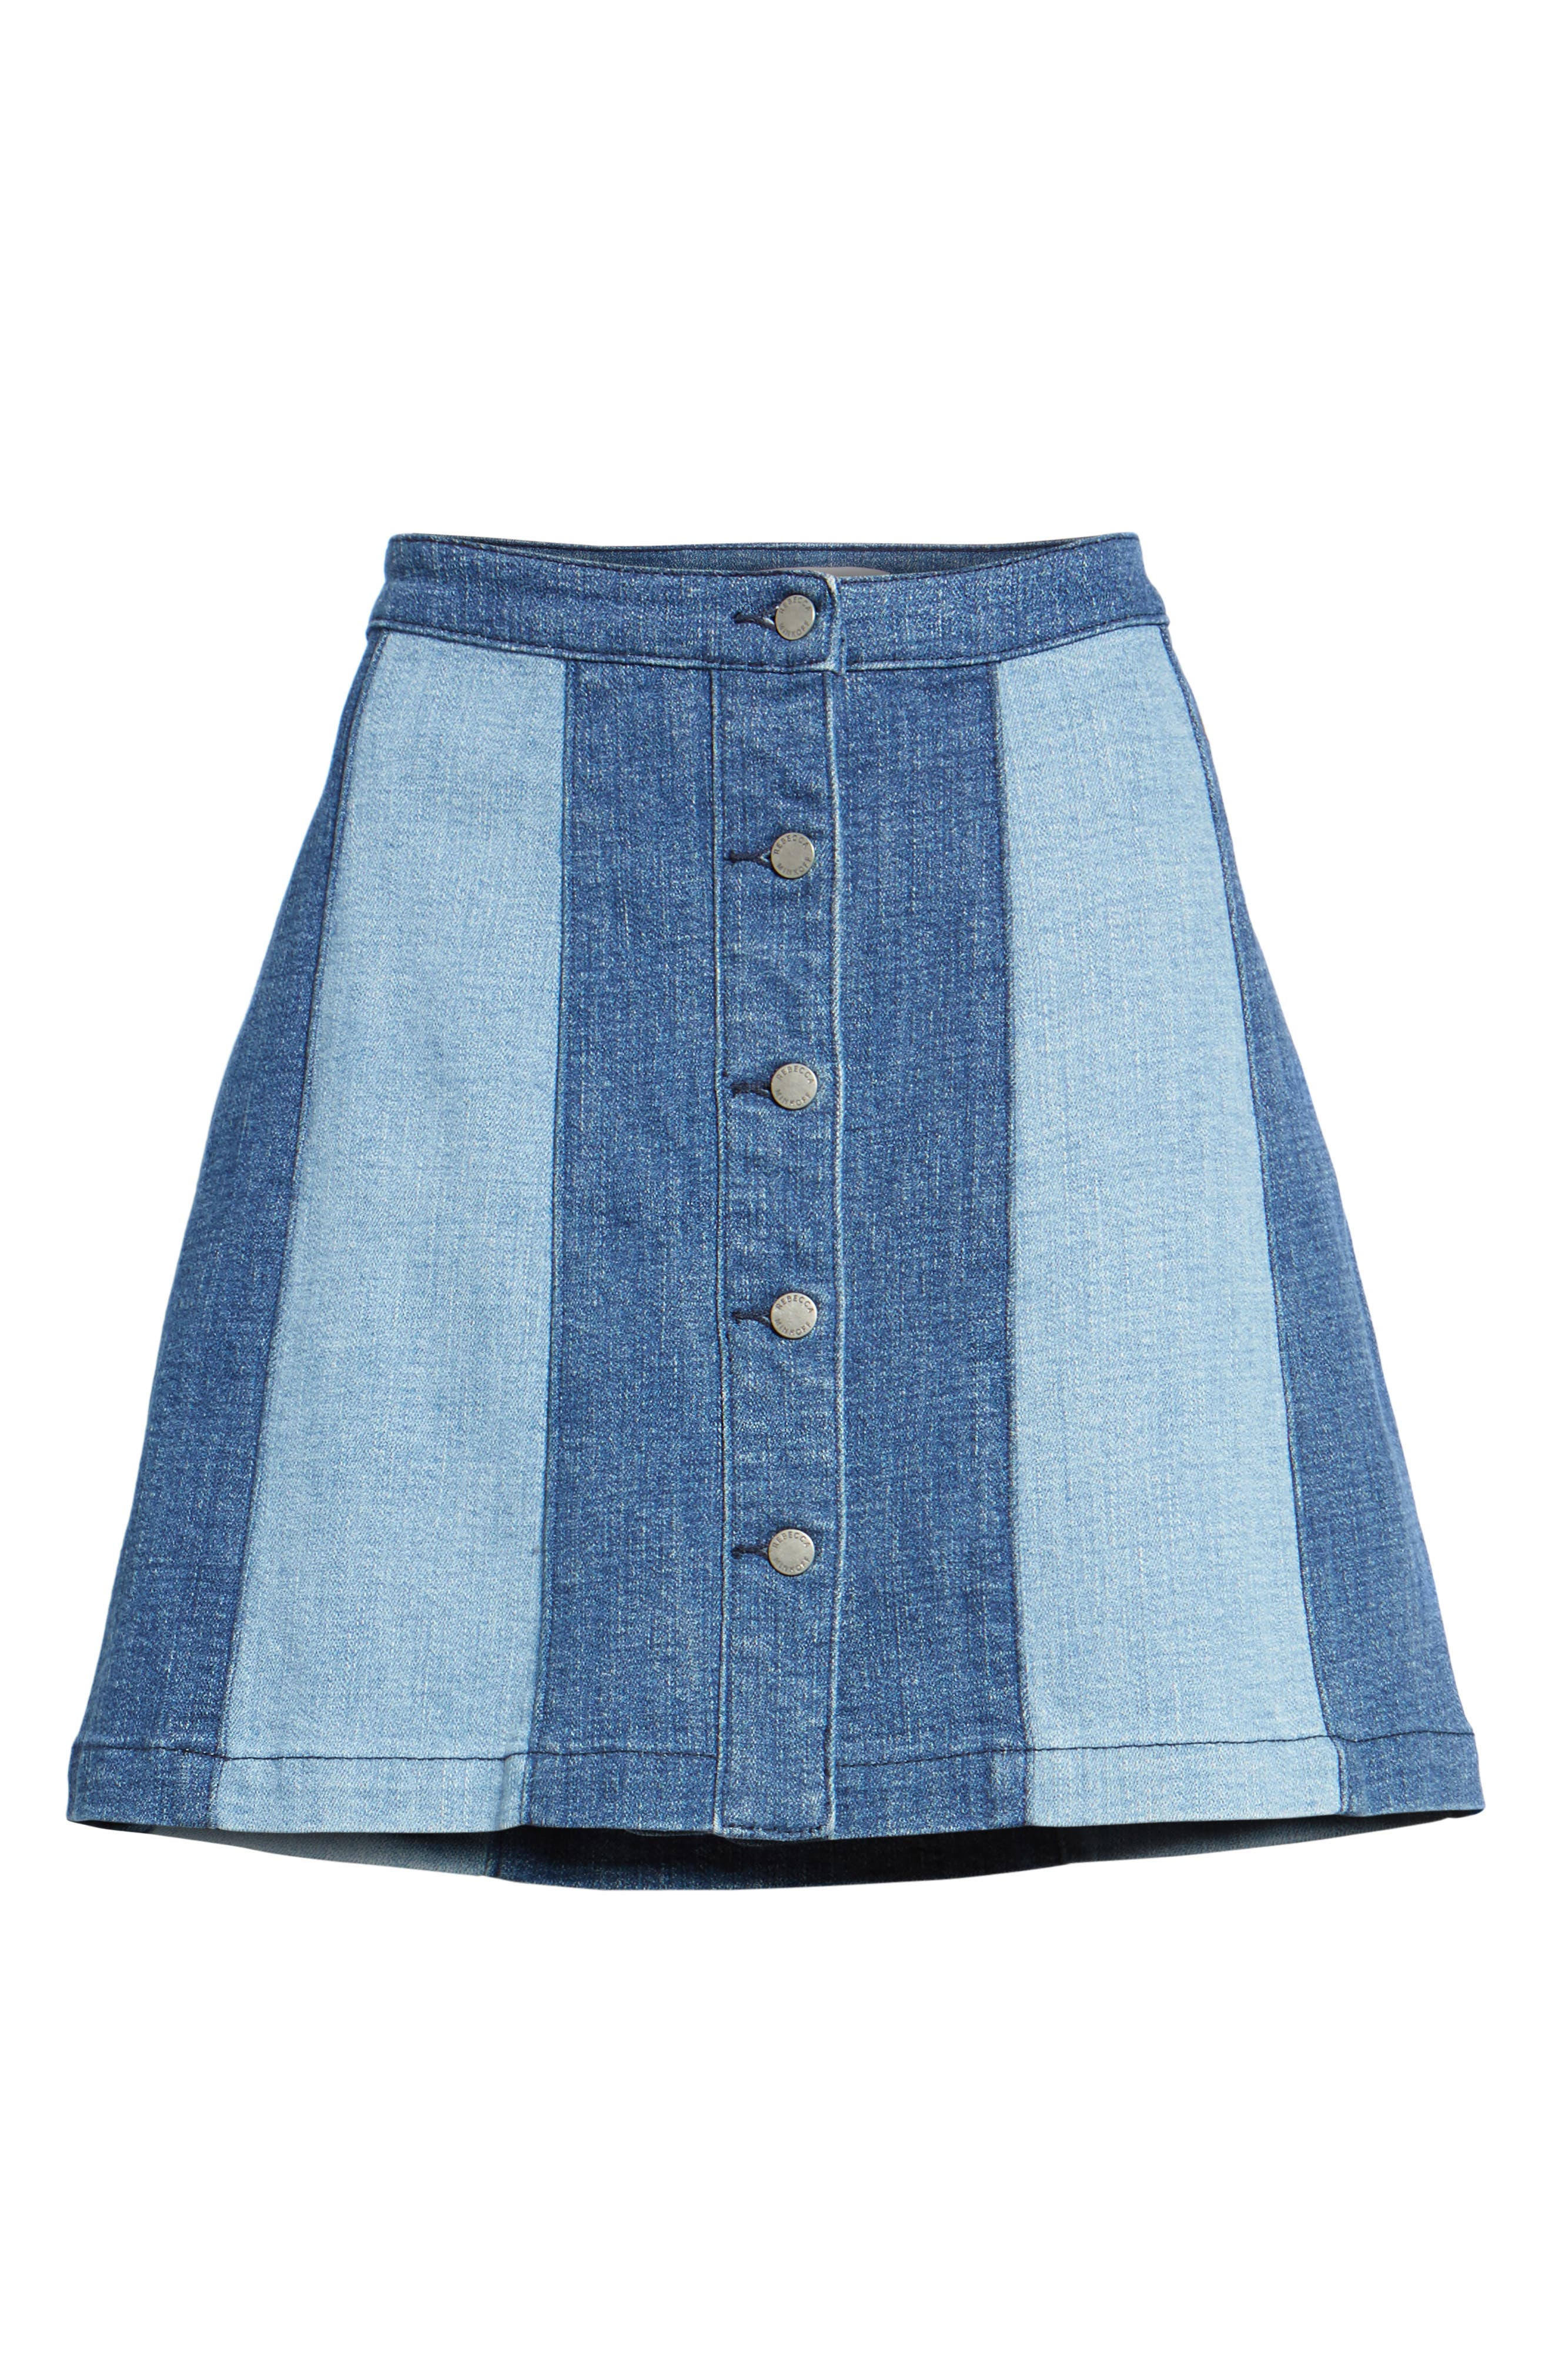 Beatty Denim Miniskirt,                             Alternate thumbnail 6, color,                             408